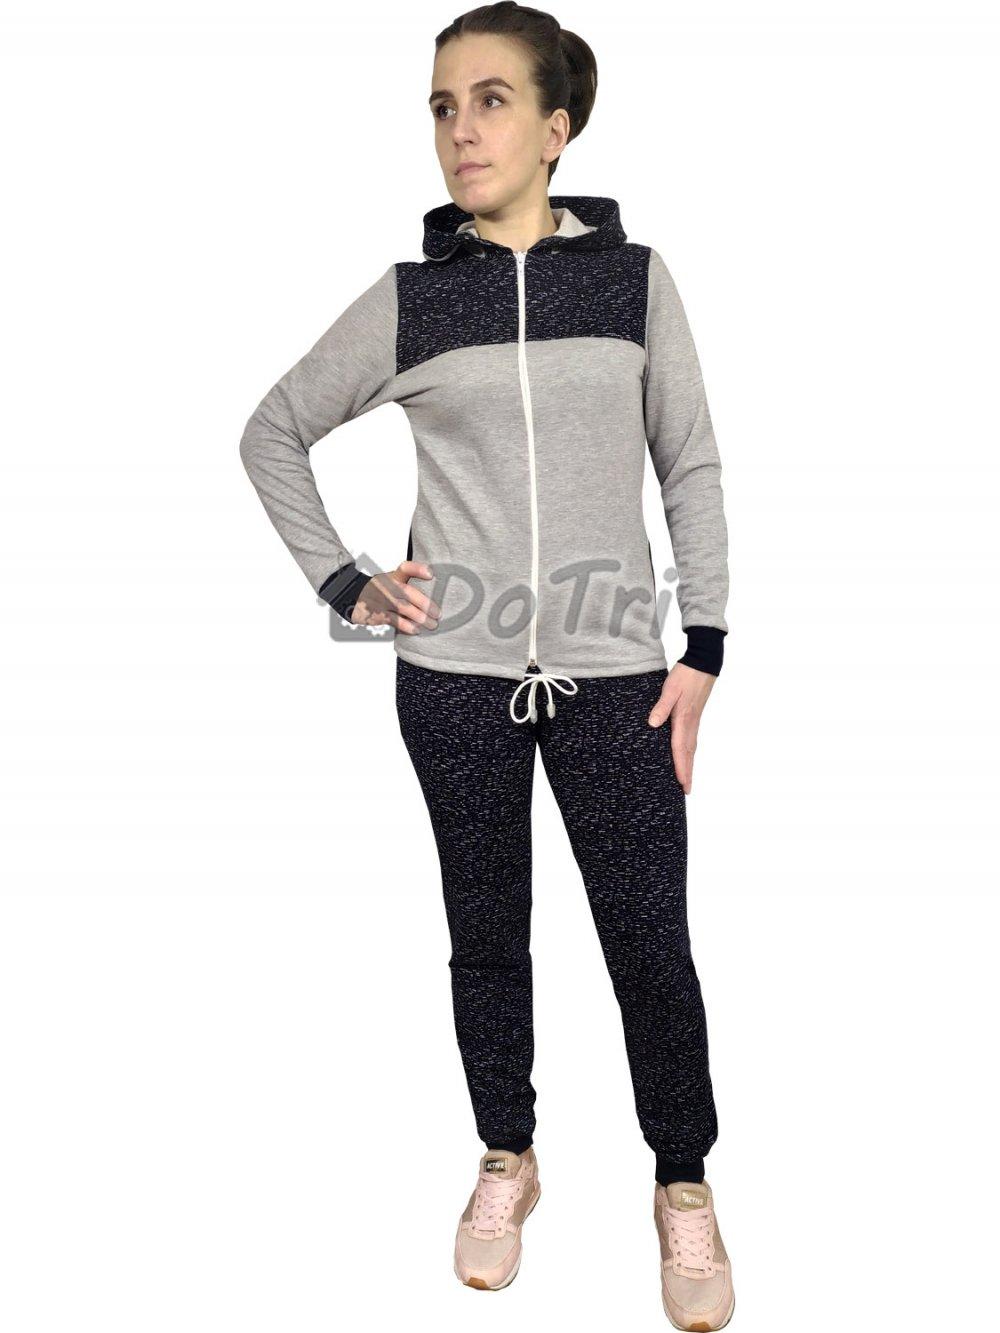 Увеличить - Спортивный костюм «Березка» серый меланж арт 002